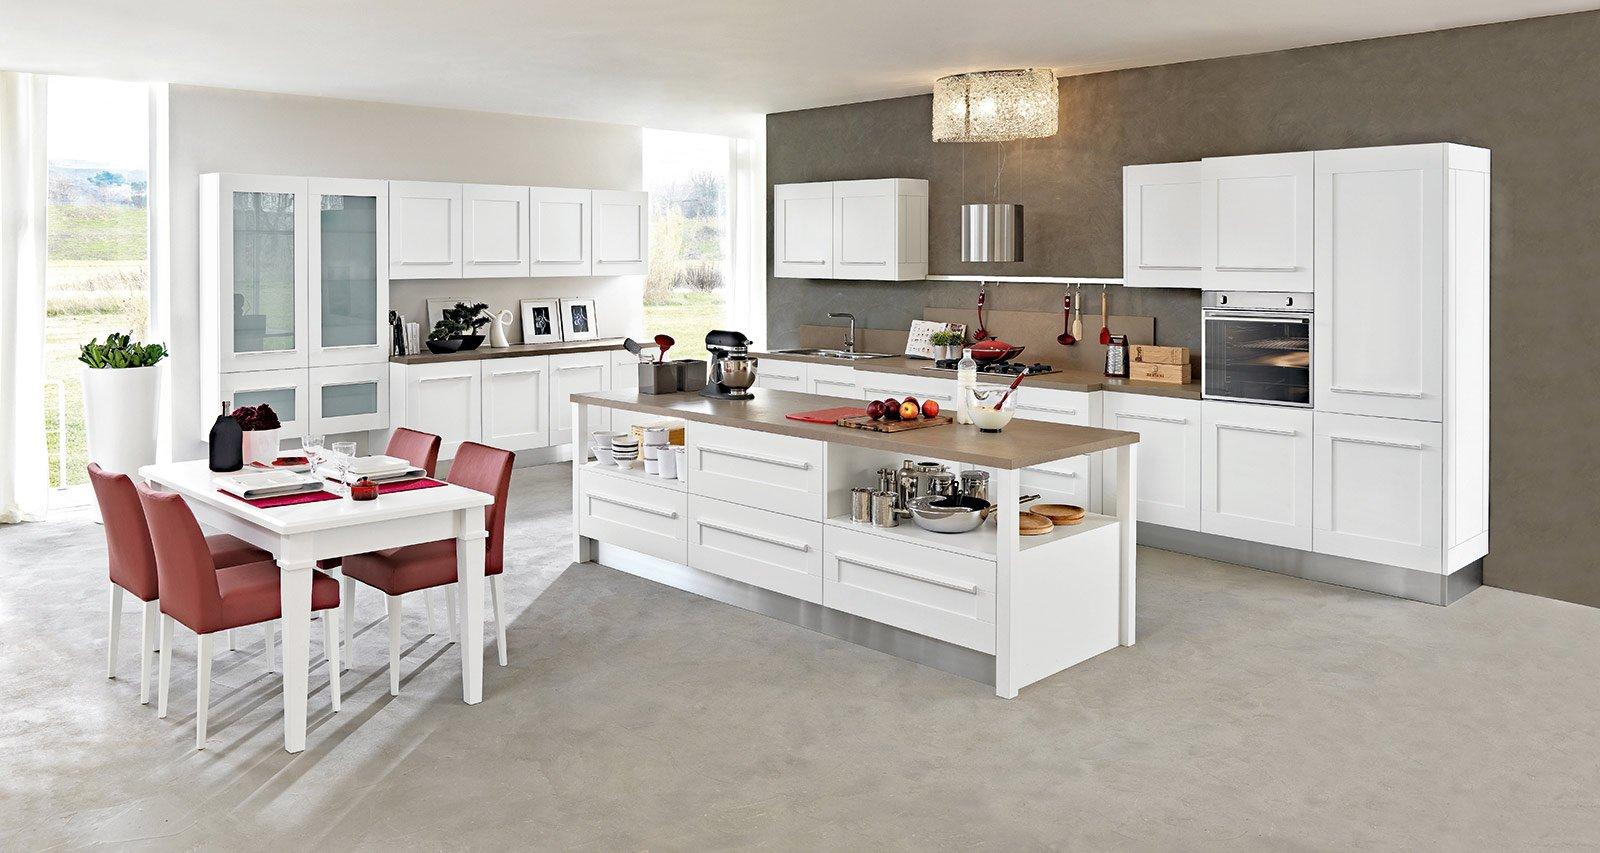 Cucina la voglio tutta bianca cose di casa - Rivestimento cucina bianca ...